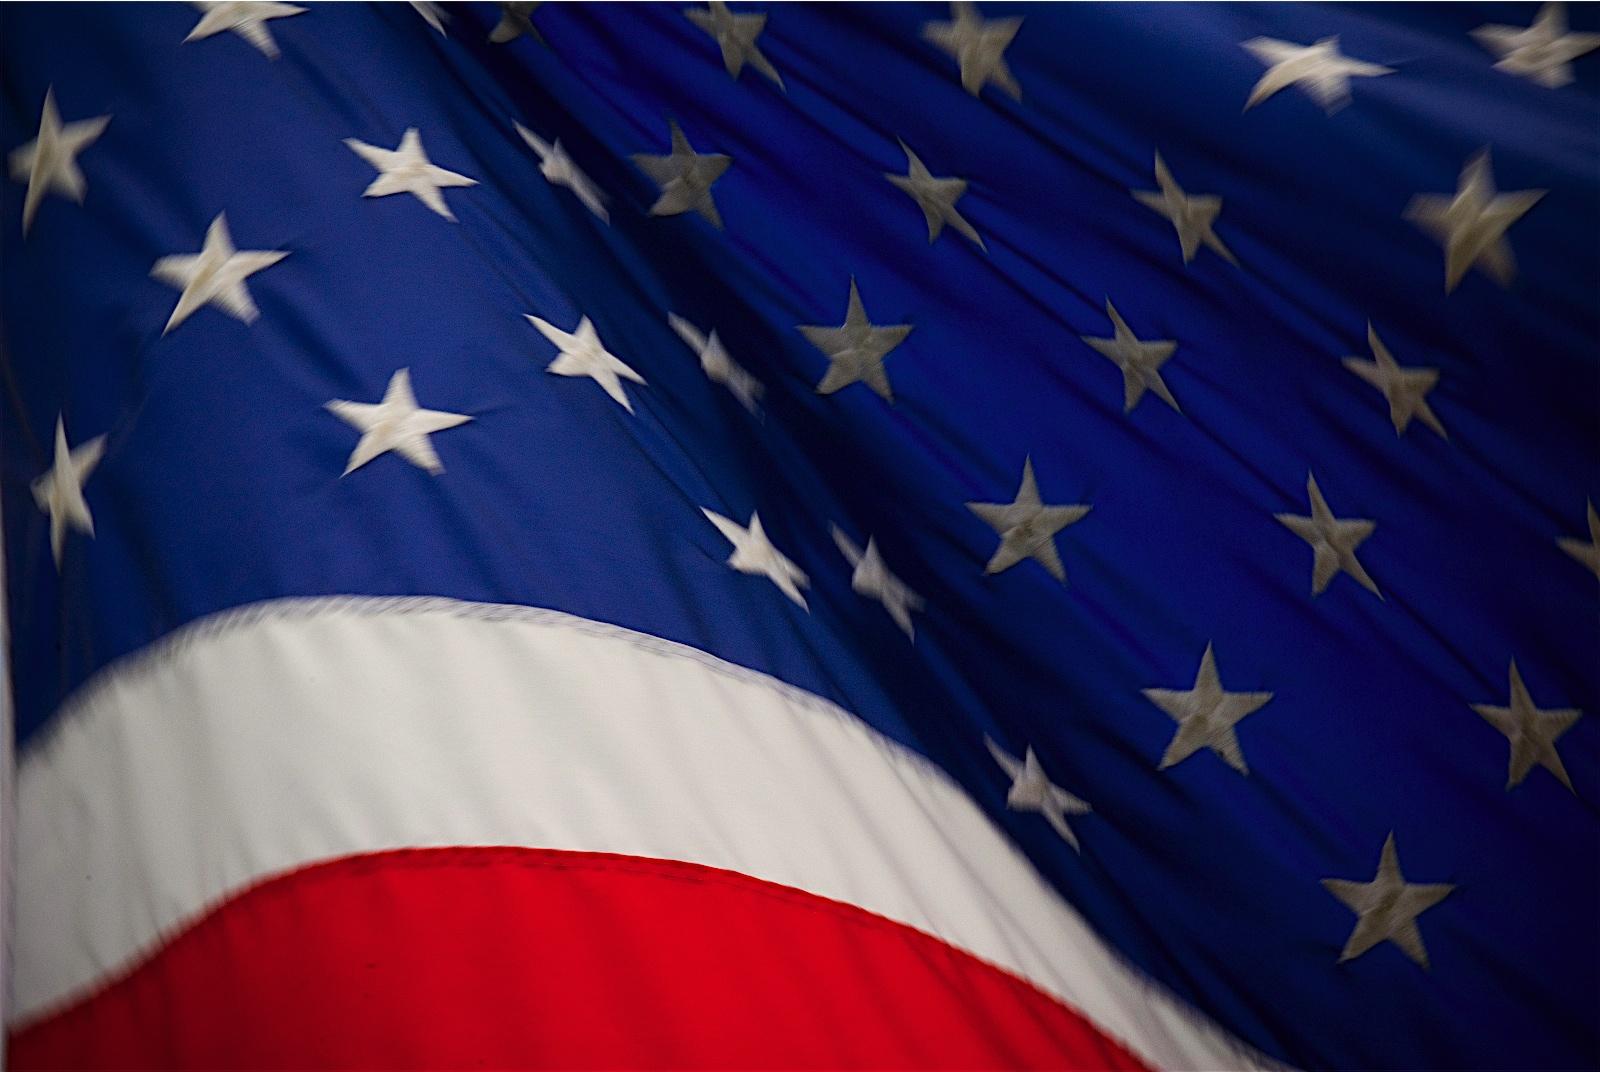 http://3.bp.blogspot.com/-rdfB6ybGhM4/UKnJFzrAobI/AAAAAAAABug/YFzSv7AWzrs/s1600/USA%2BFlag%2Bthe%2Bbest%2Bquality%2Bwallpaper.jpg